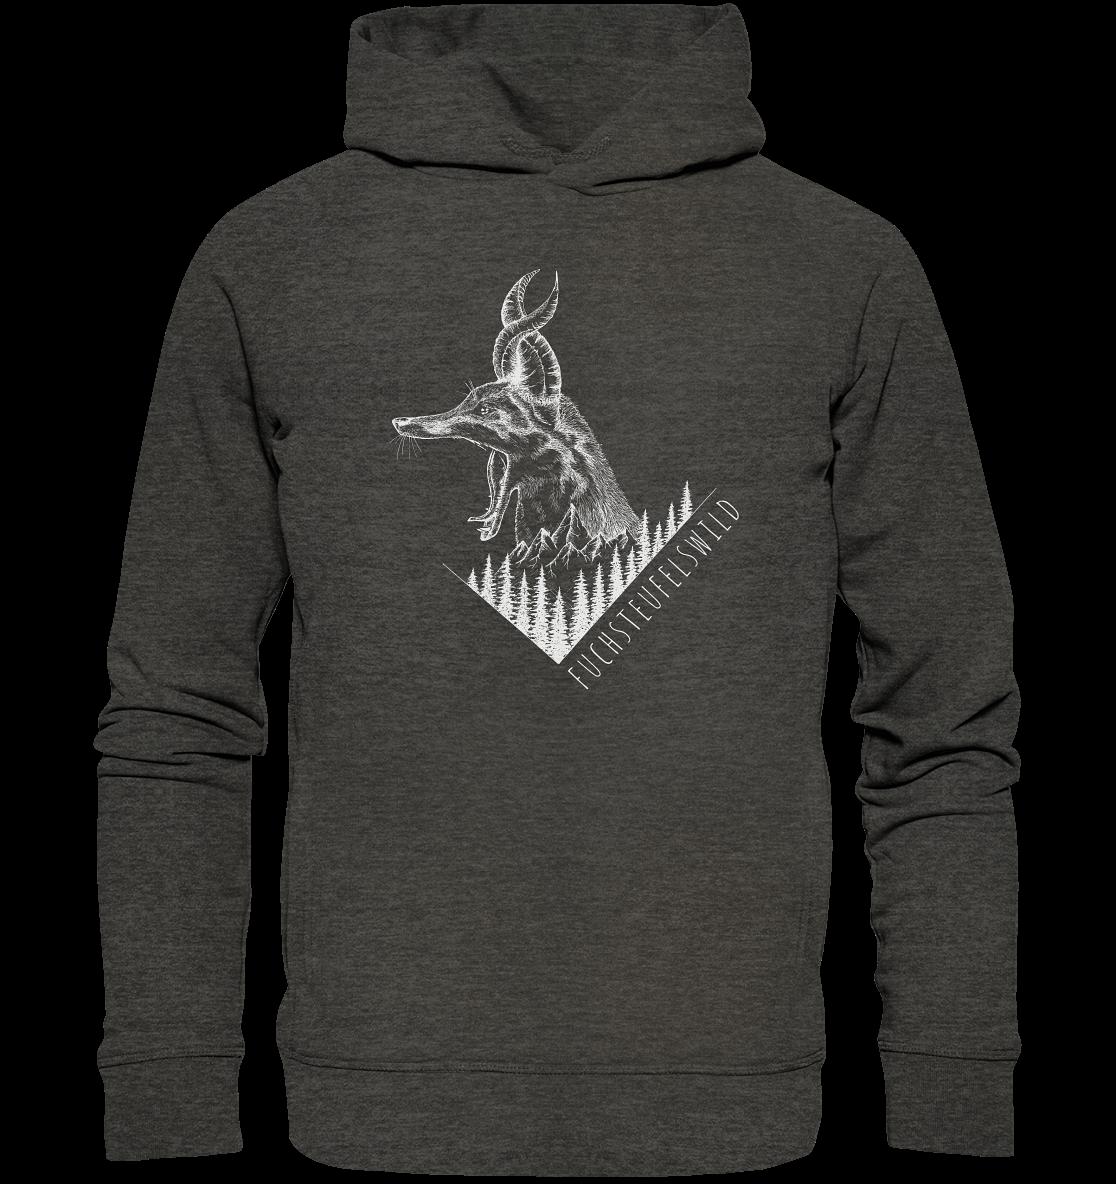 front-organic-fashion-hoodie-252625-1116x-3.png